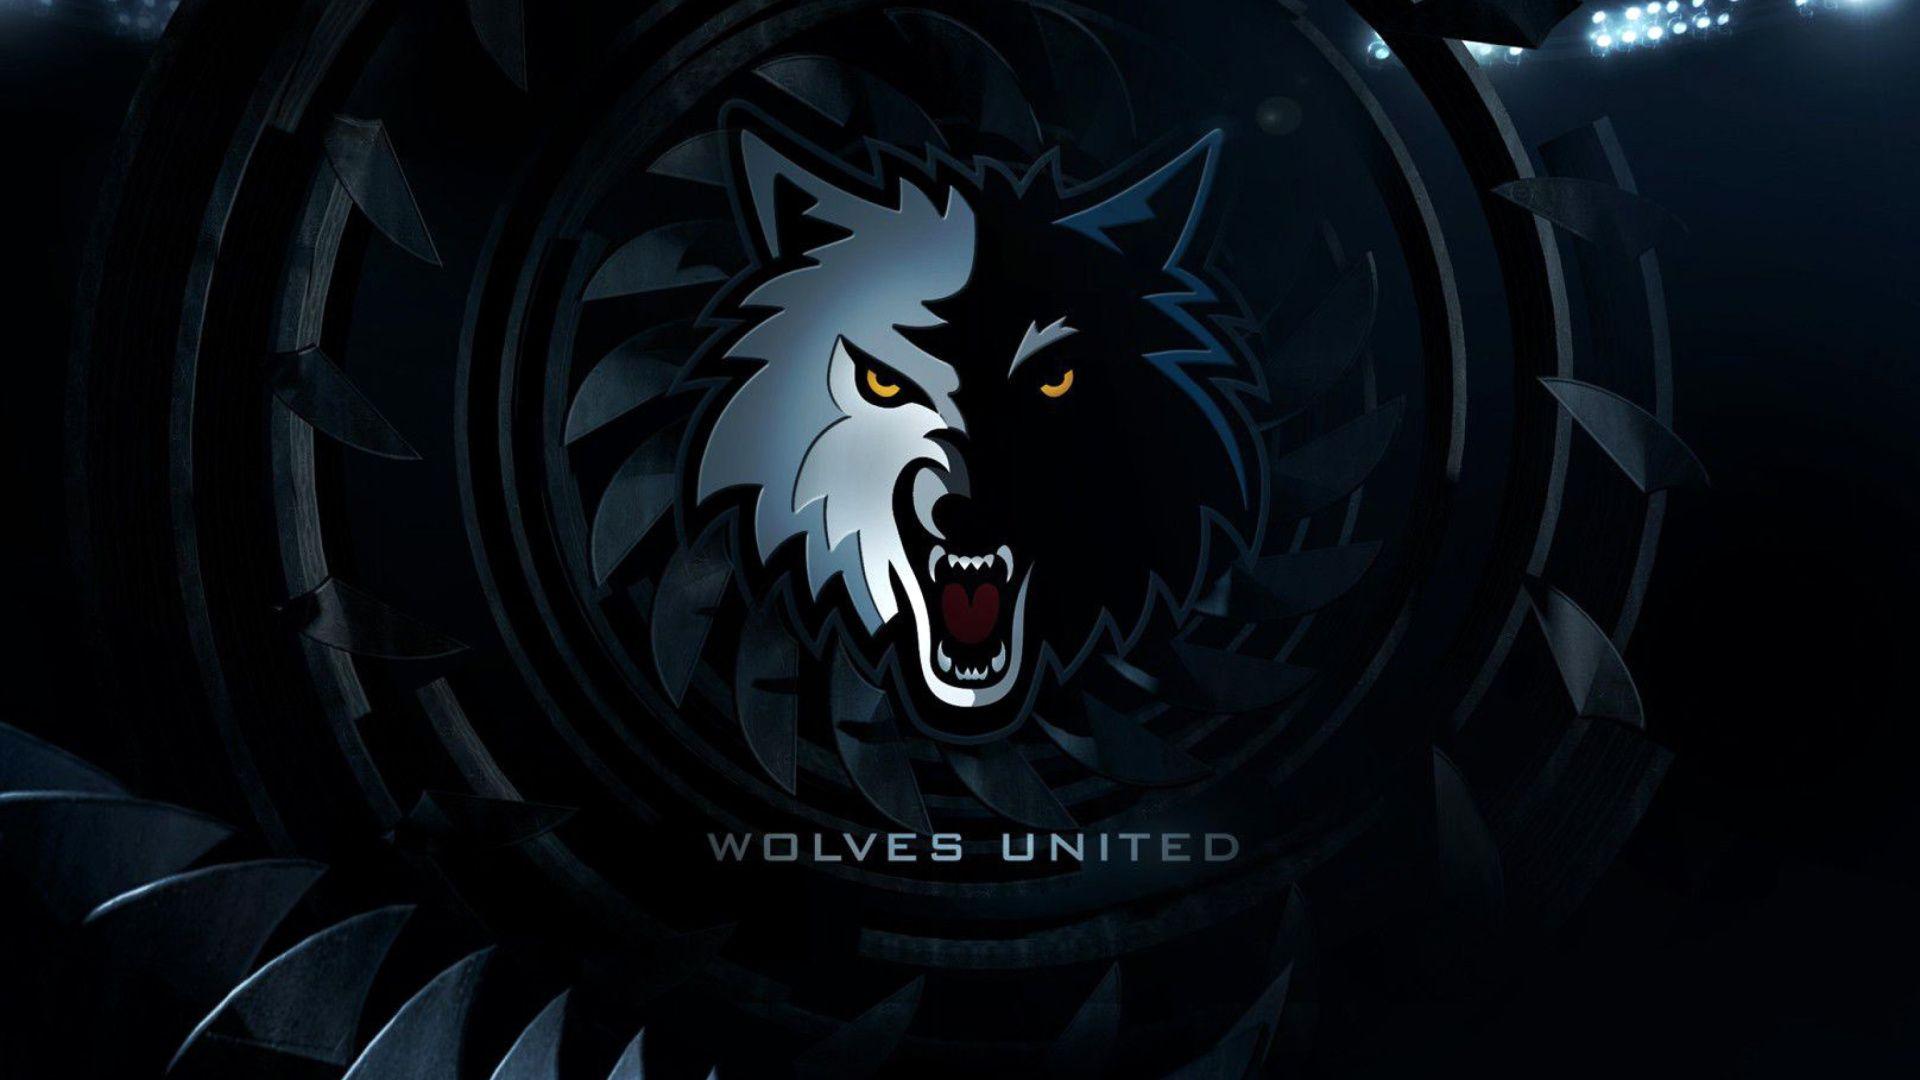 Minnesota Timberwolves background